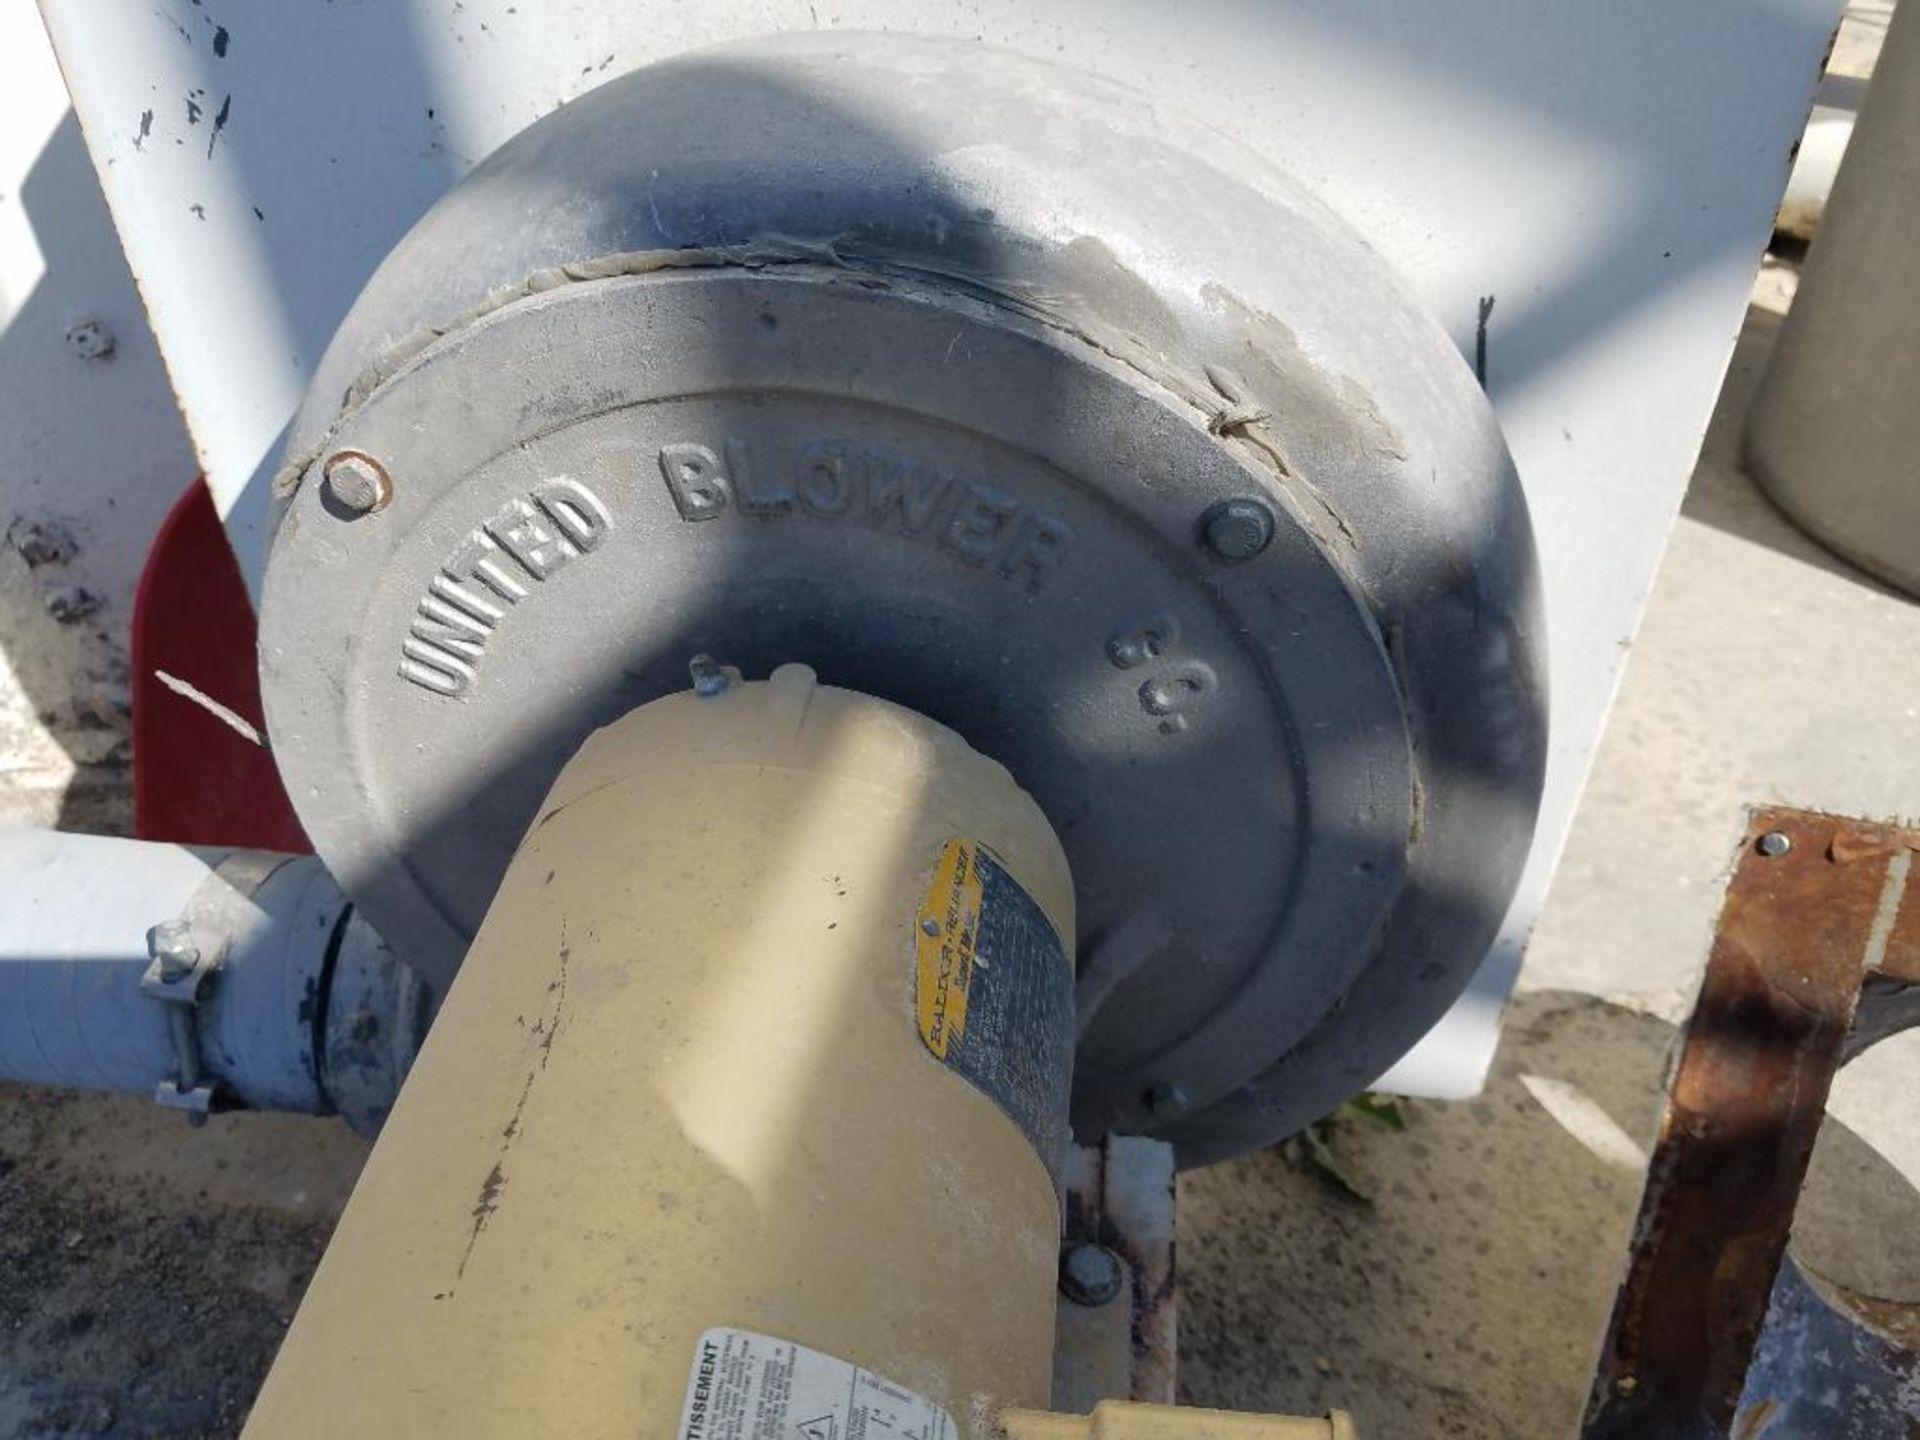 United blower - Image 4 of 5